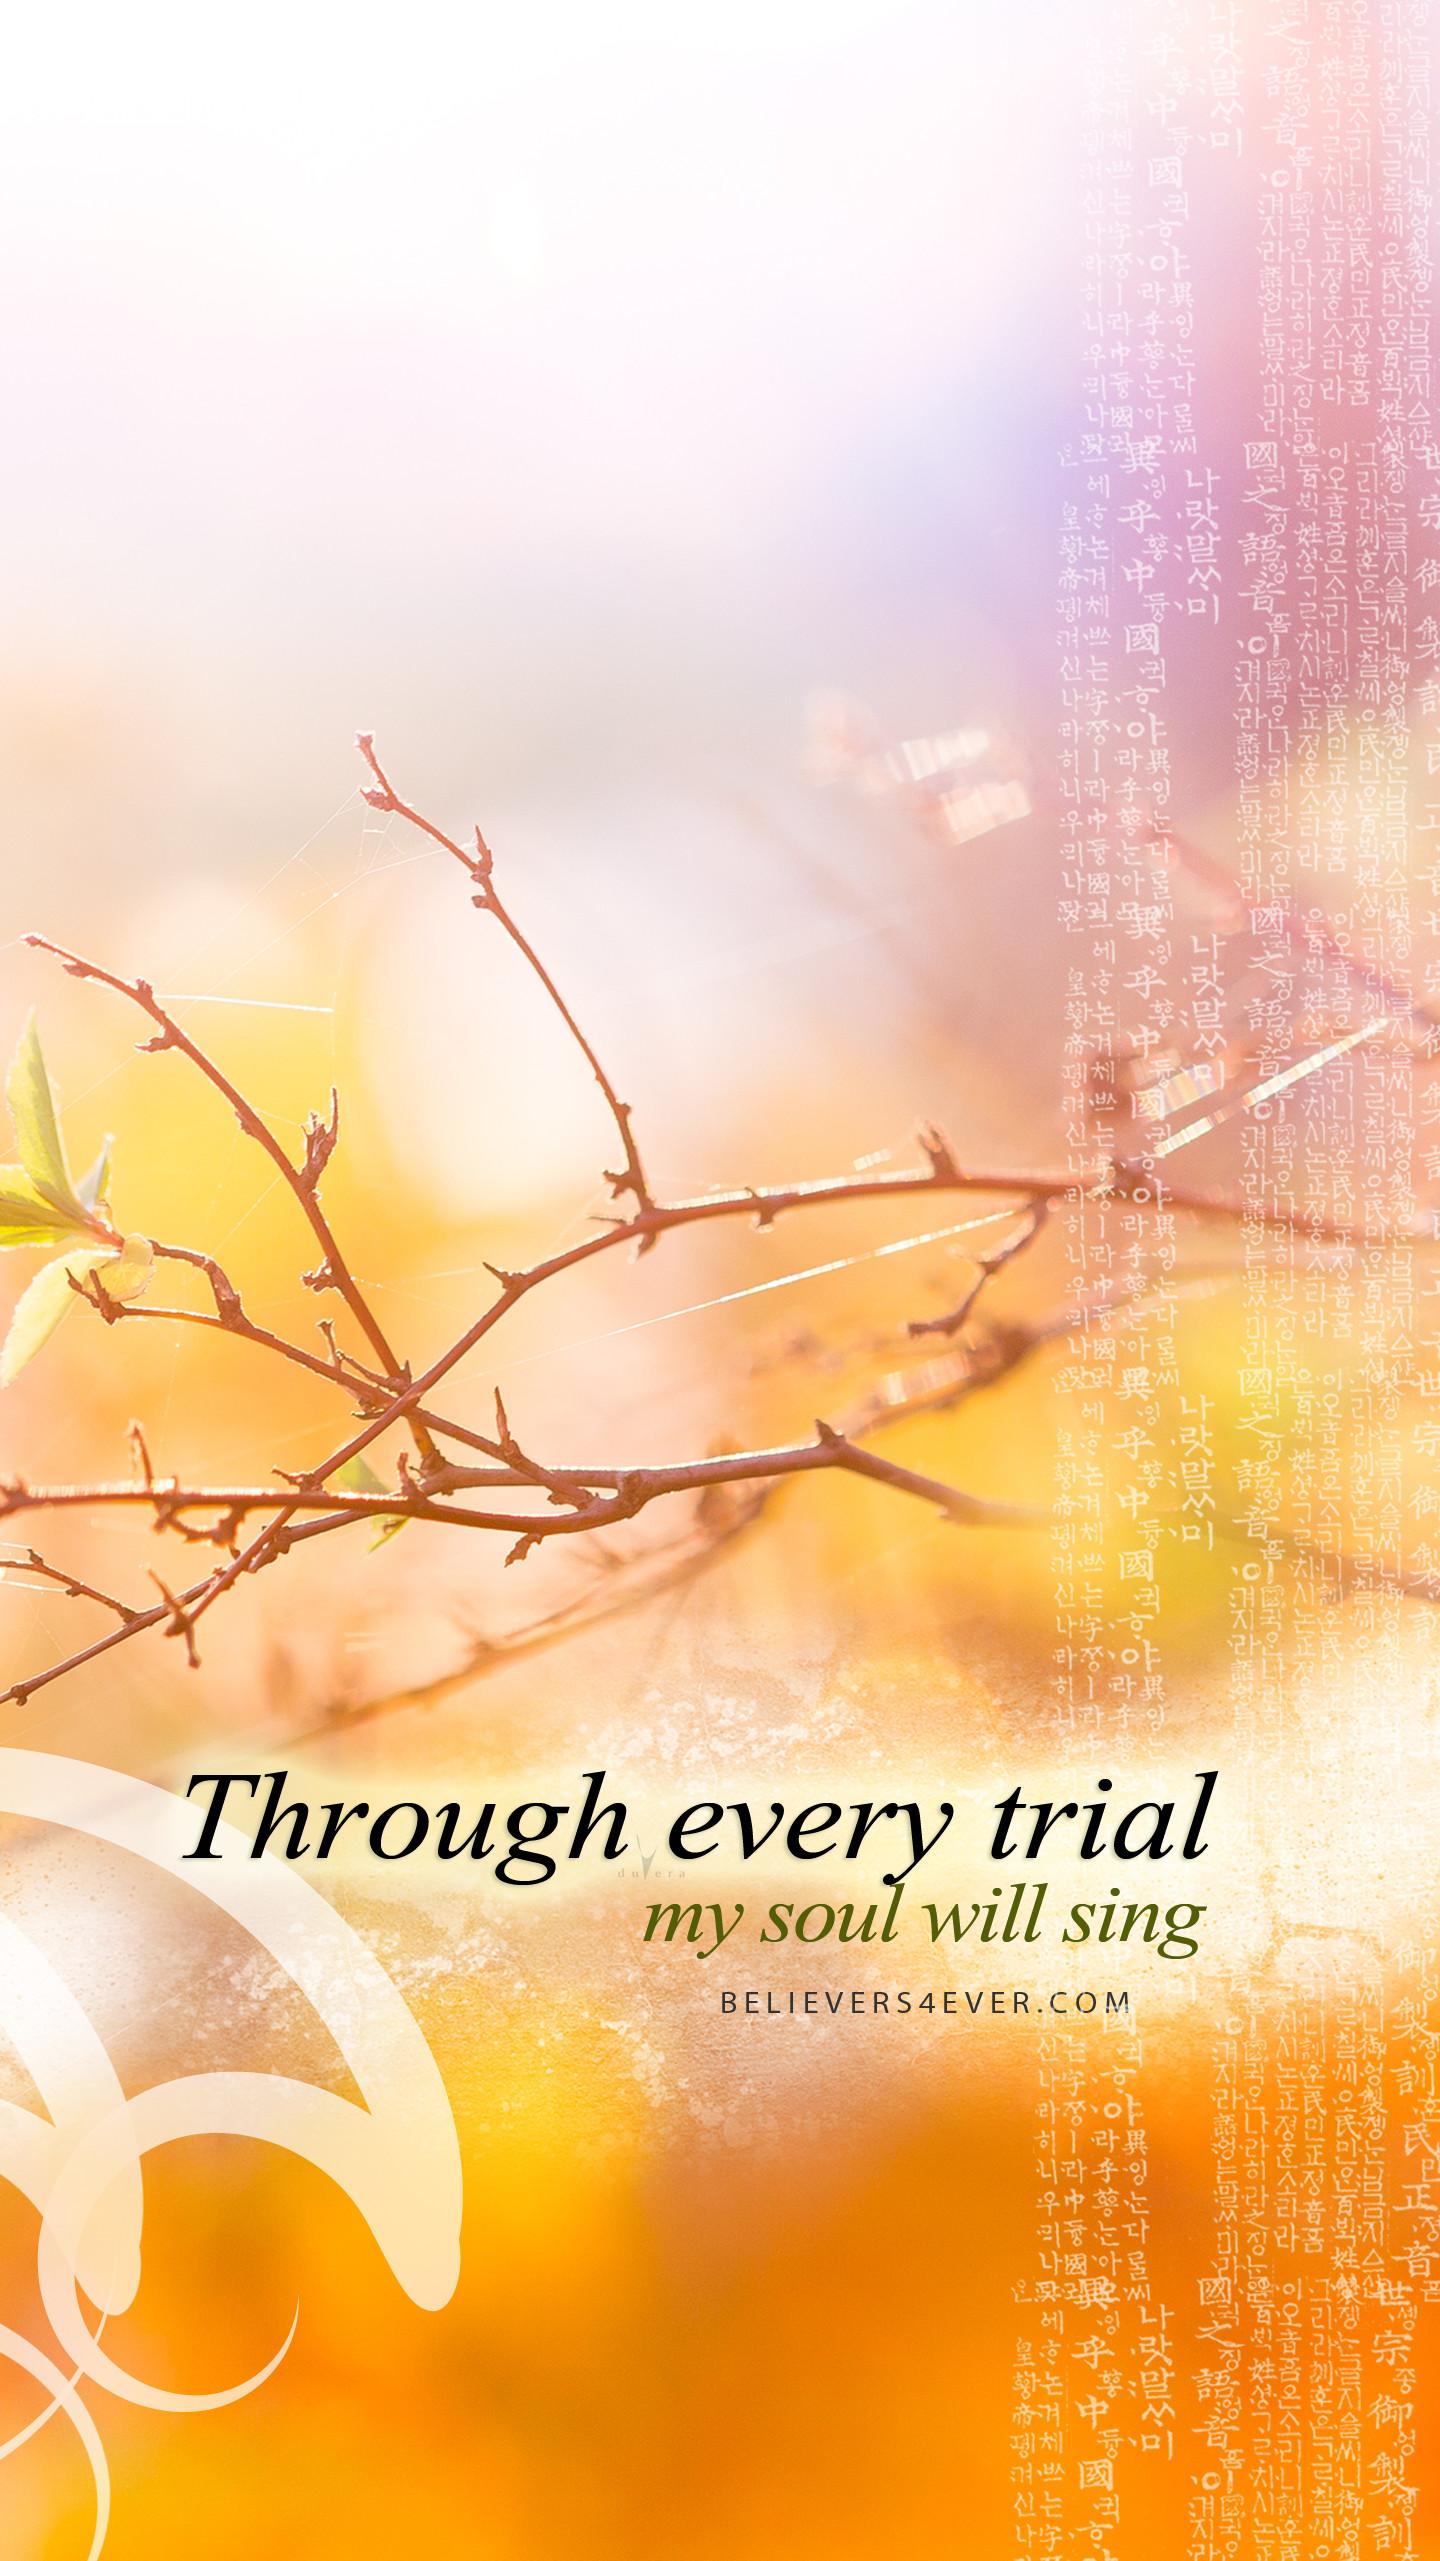 Through every trial